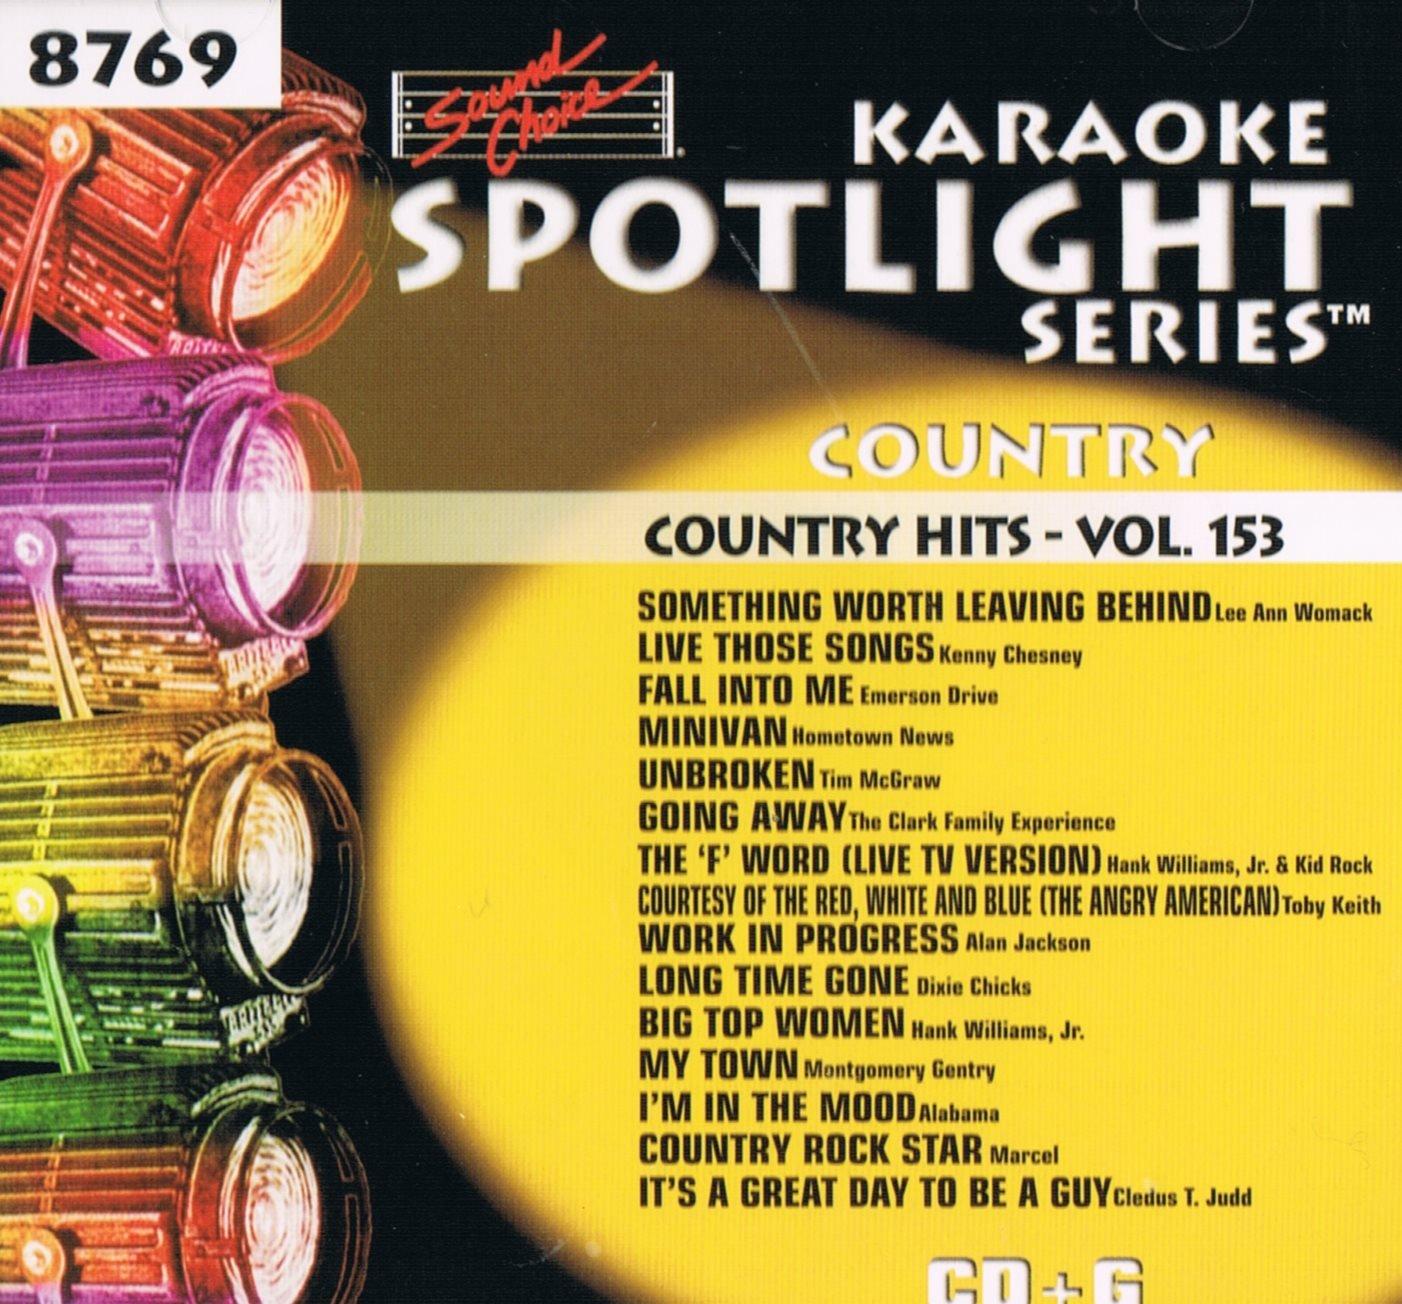 Sound Choice Karaoke Spotlight Series Country Hits Vol.153-8769 by